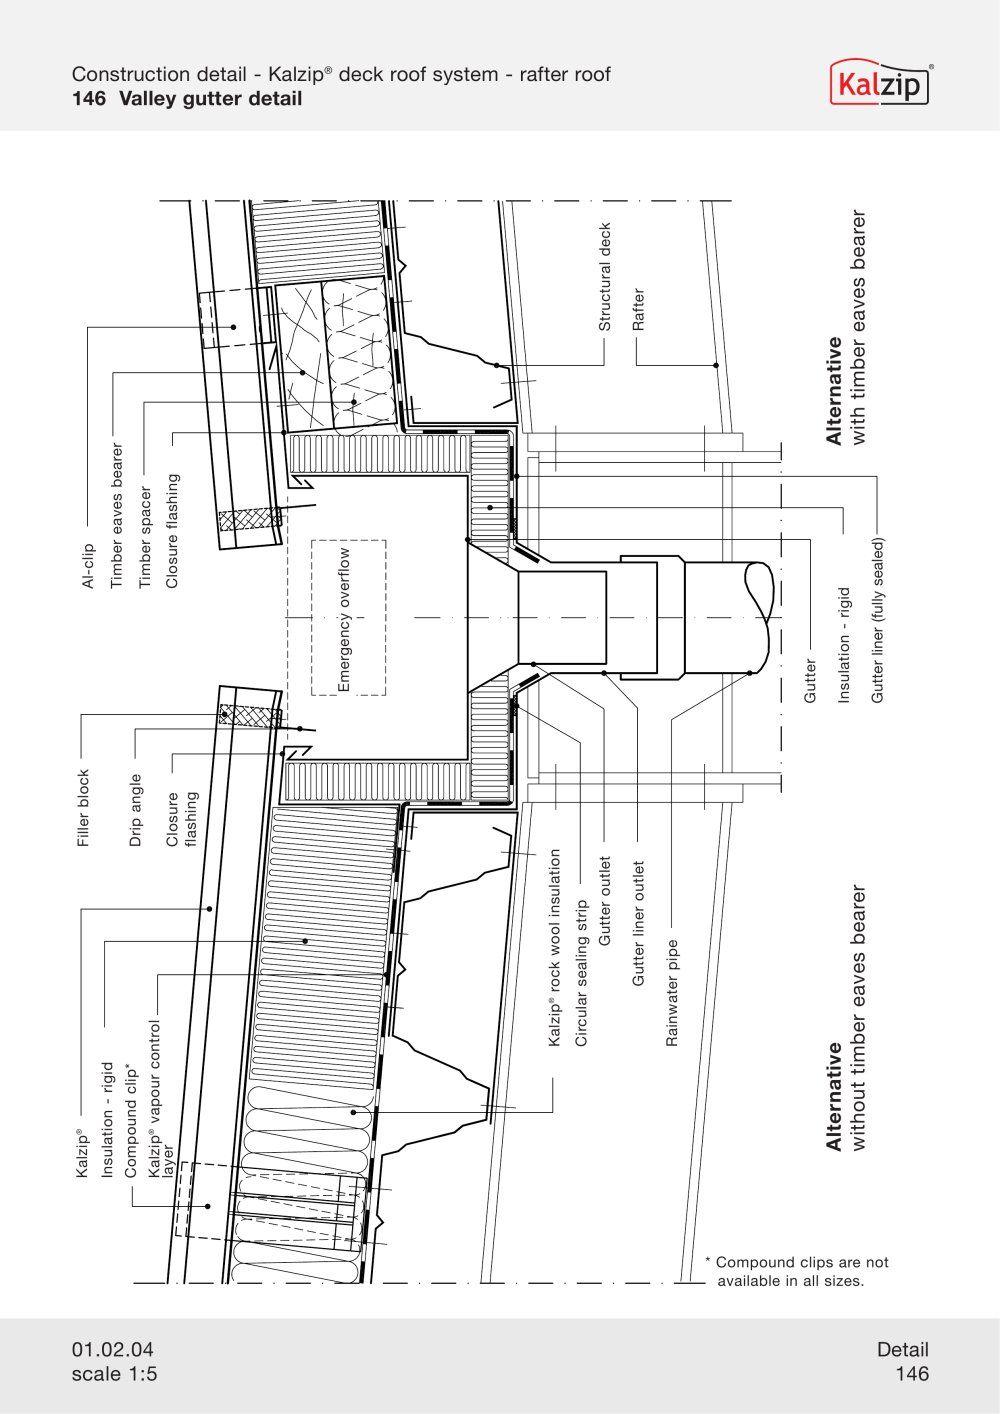 Kalzip Construction Details Archiexpo Roof Construction Roof